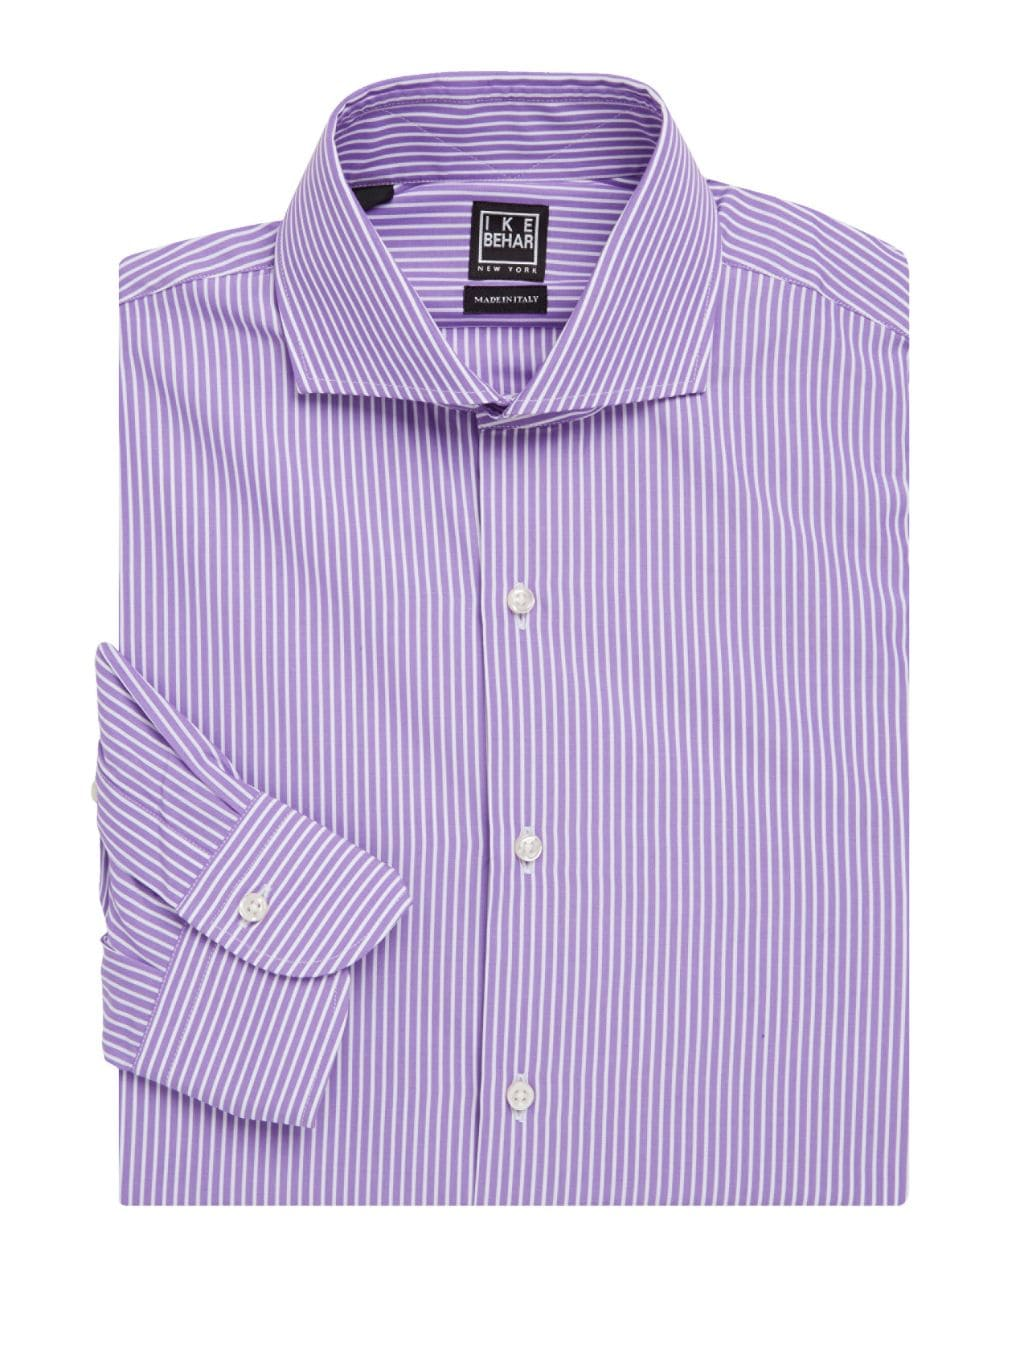 IKE by Ike Behar Striped Button-Front Shirt